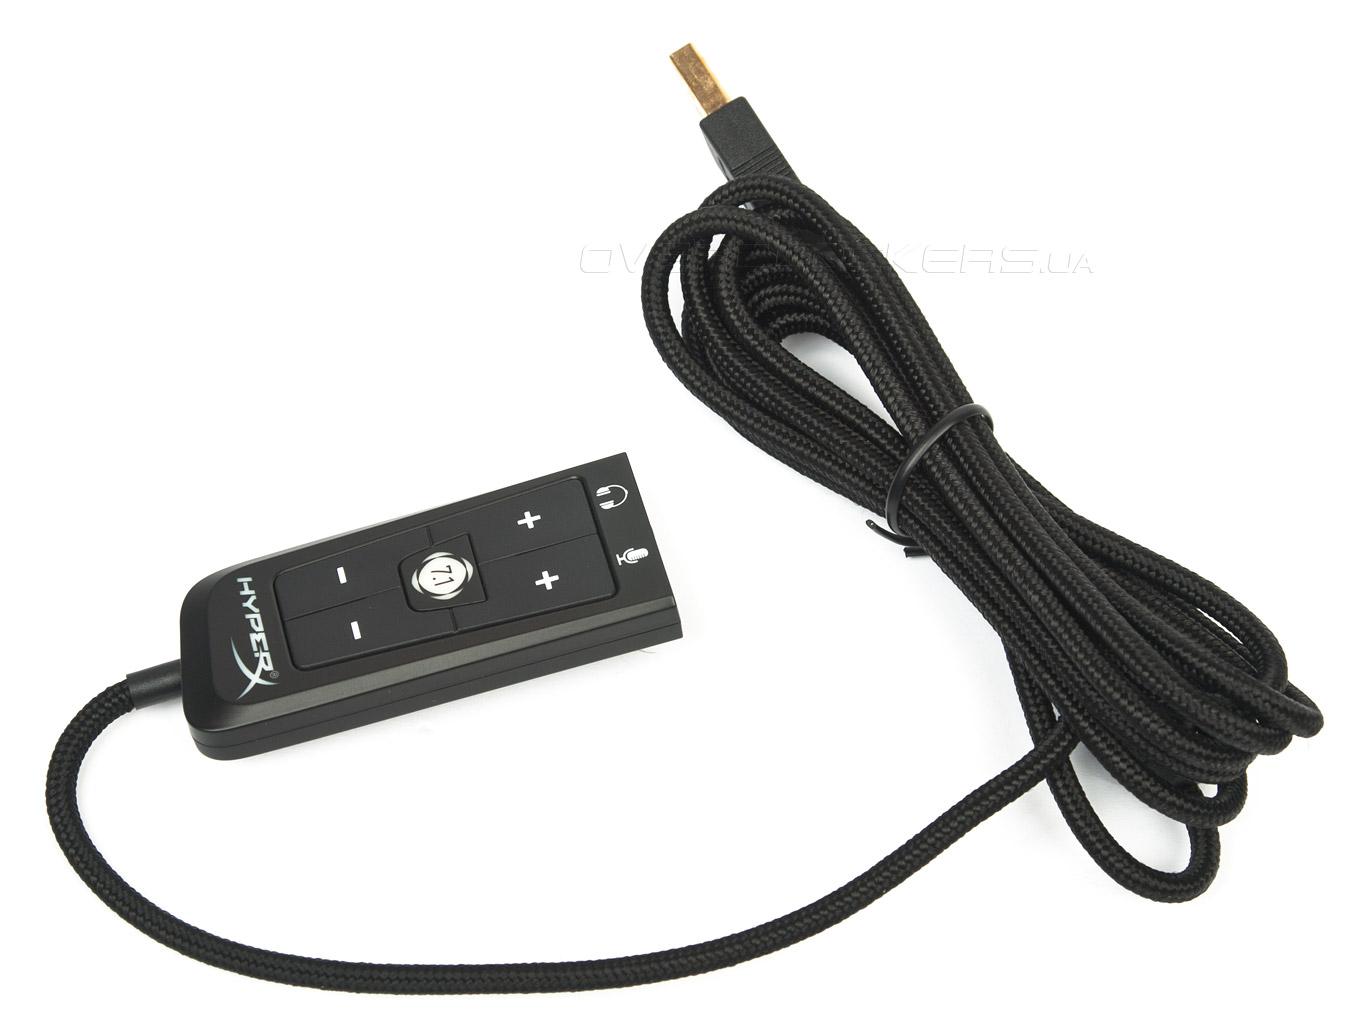 usb адаптер для микрофона схема